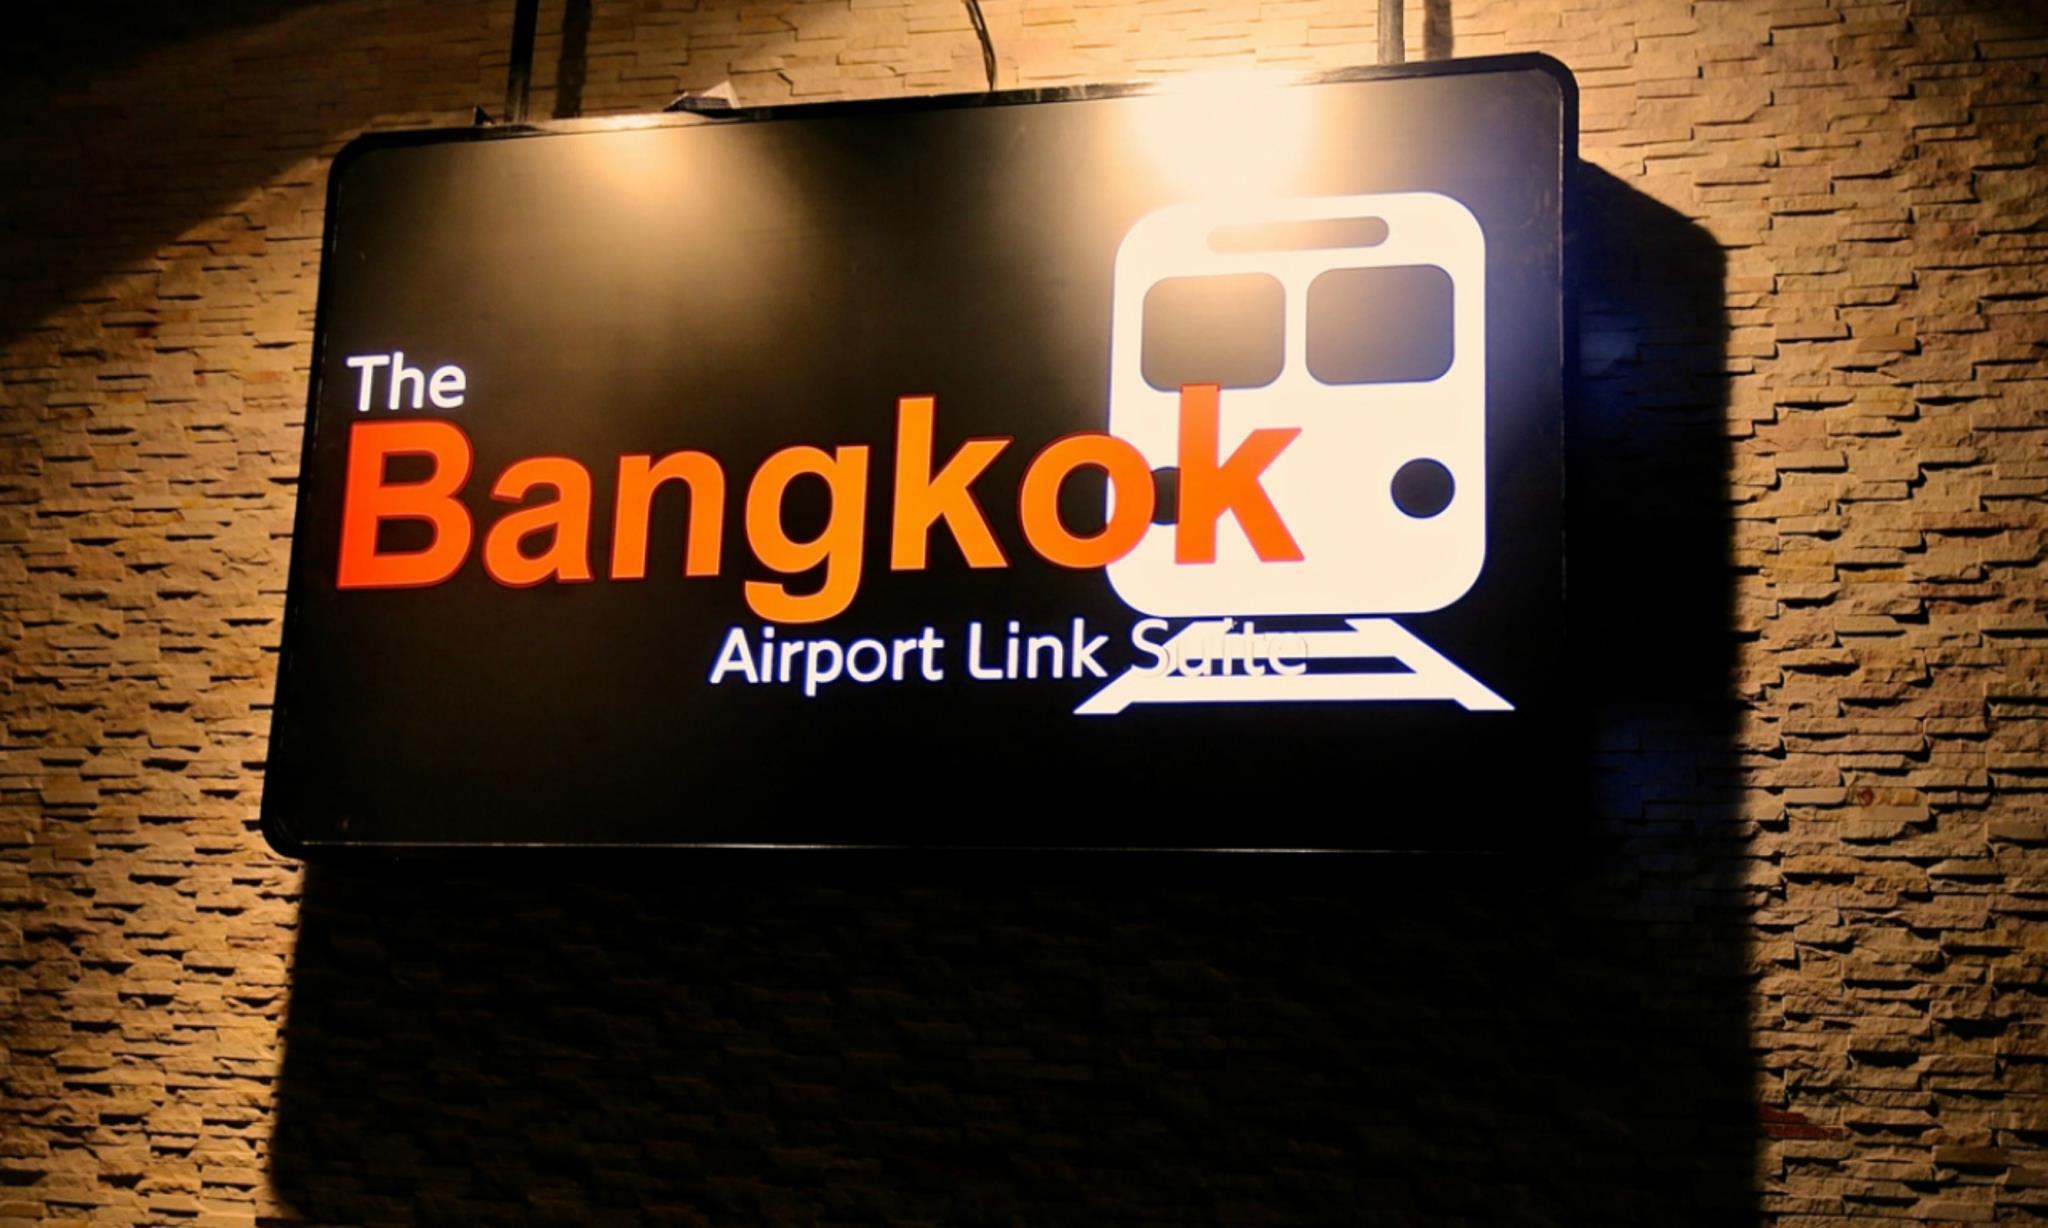 The Bangkok Airport Link Suite